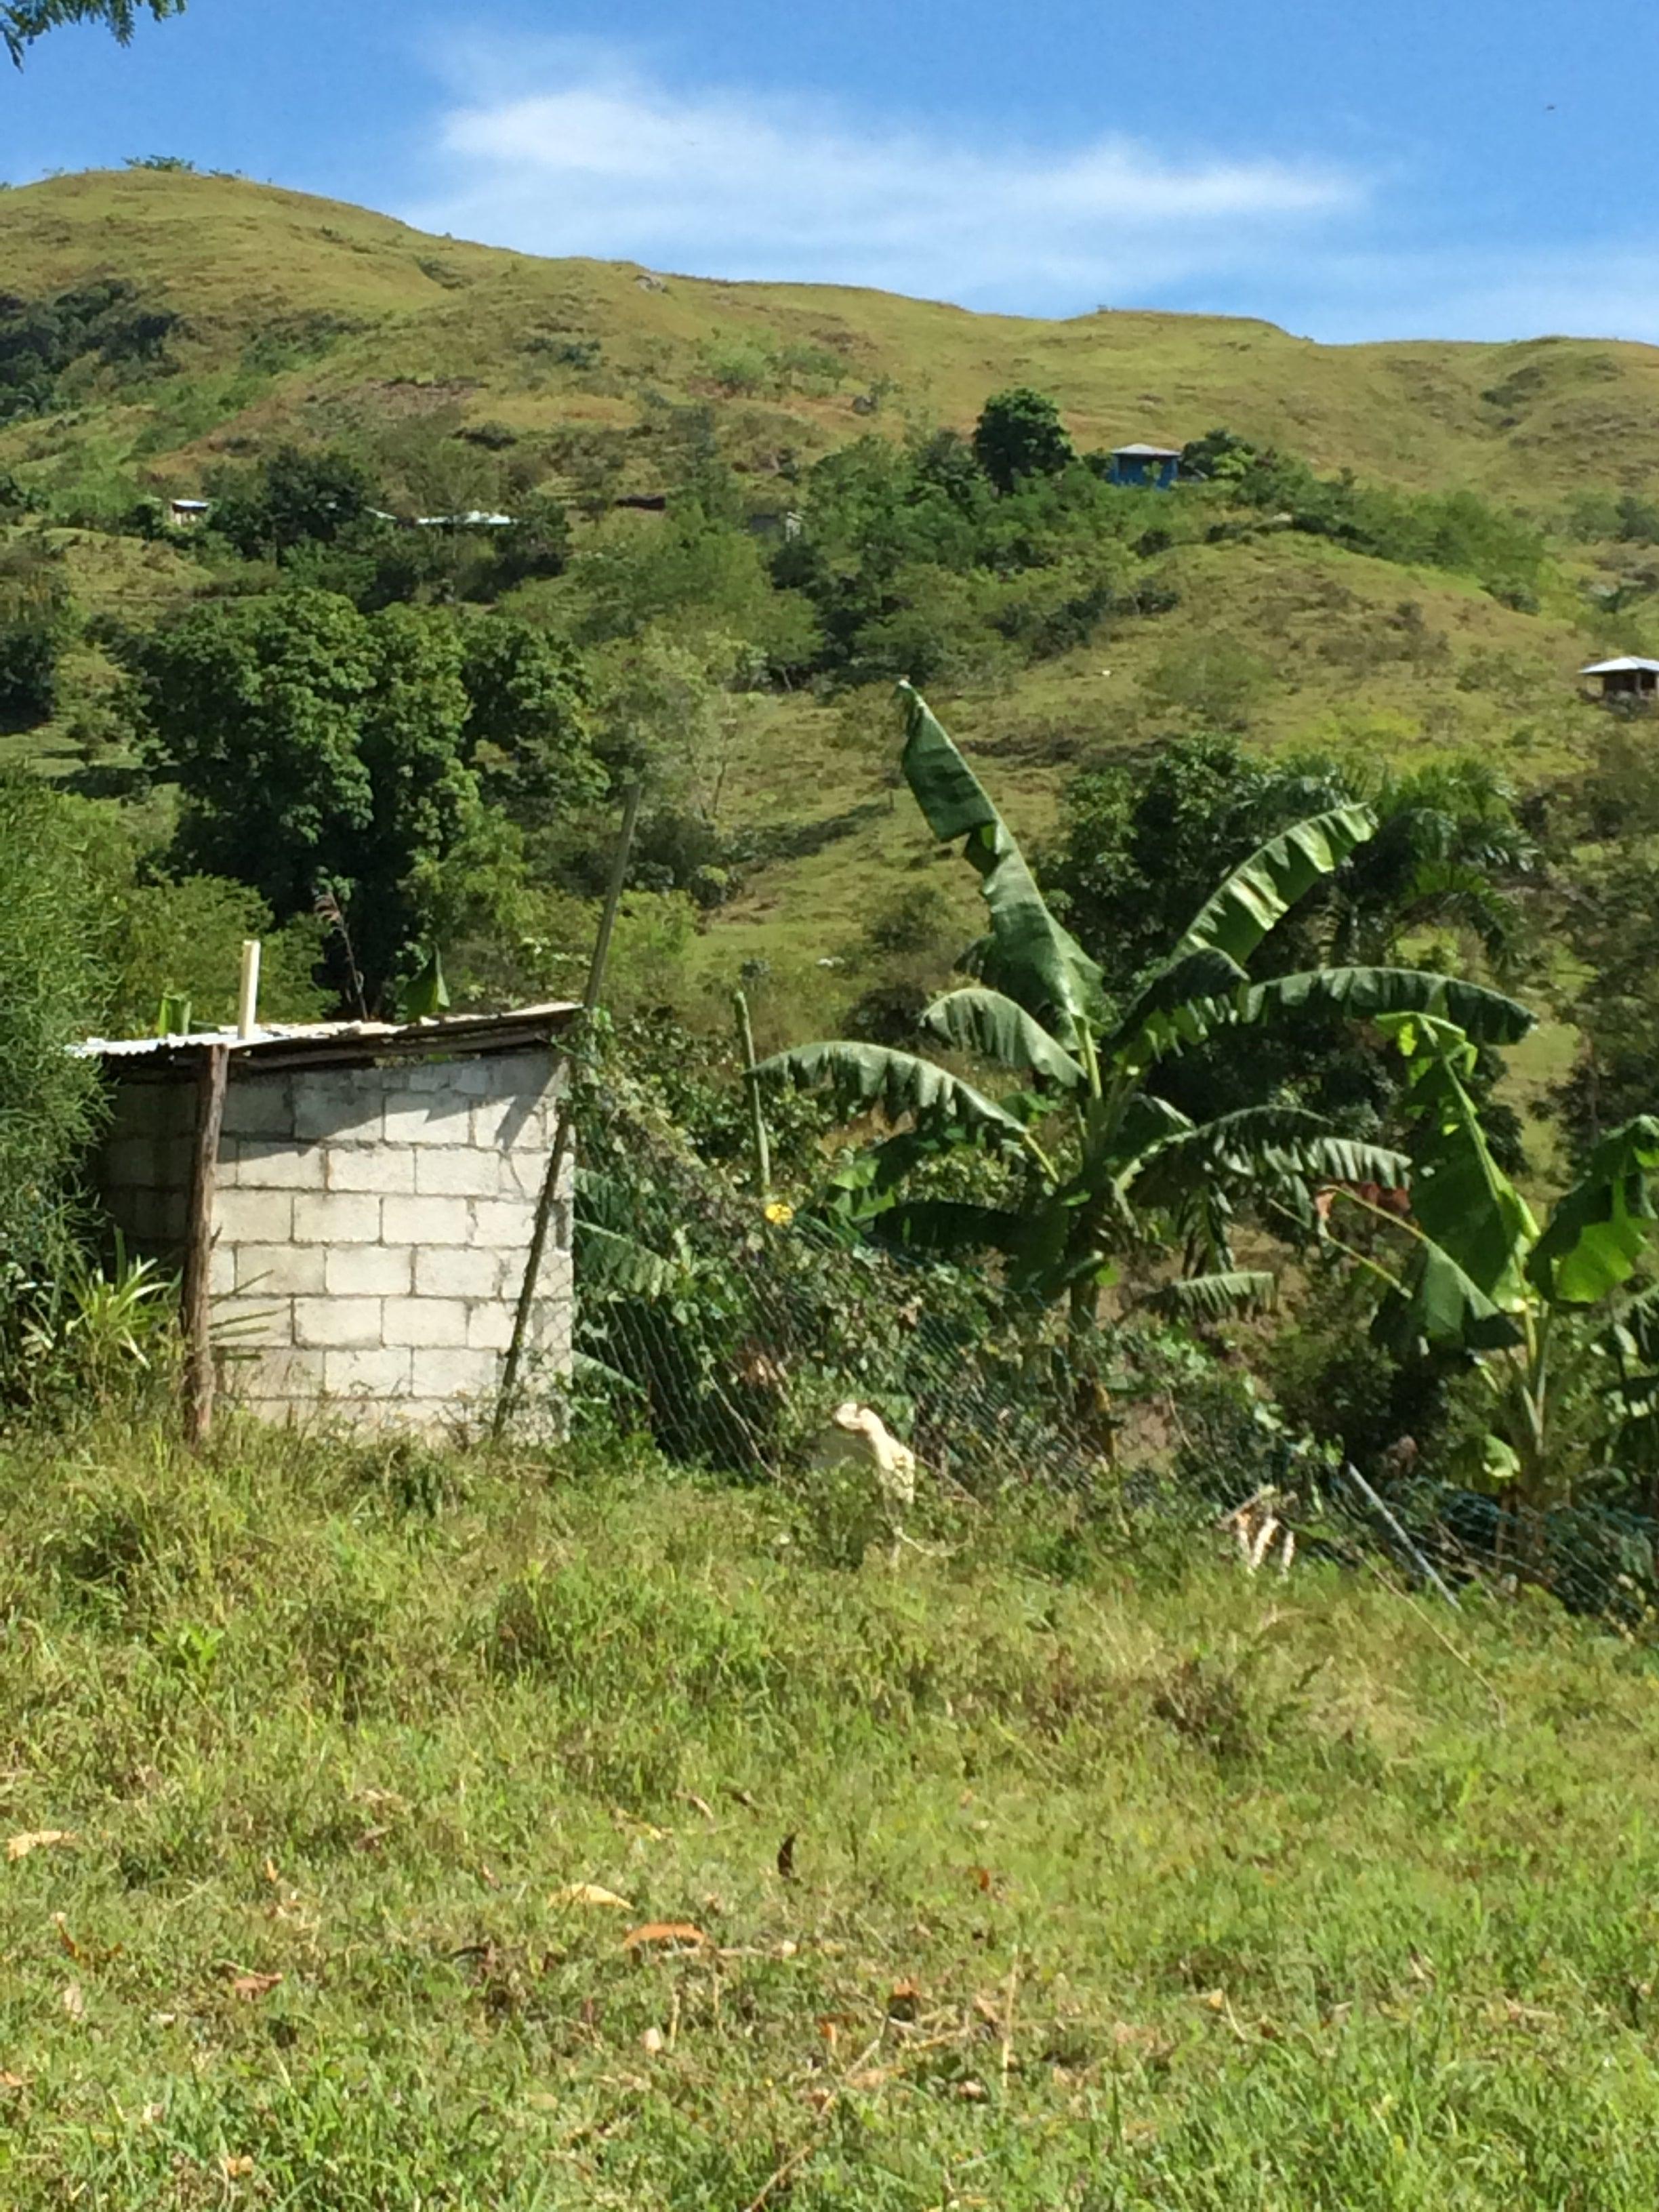 Sanitation For All – Including Girls in School